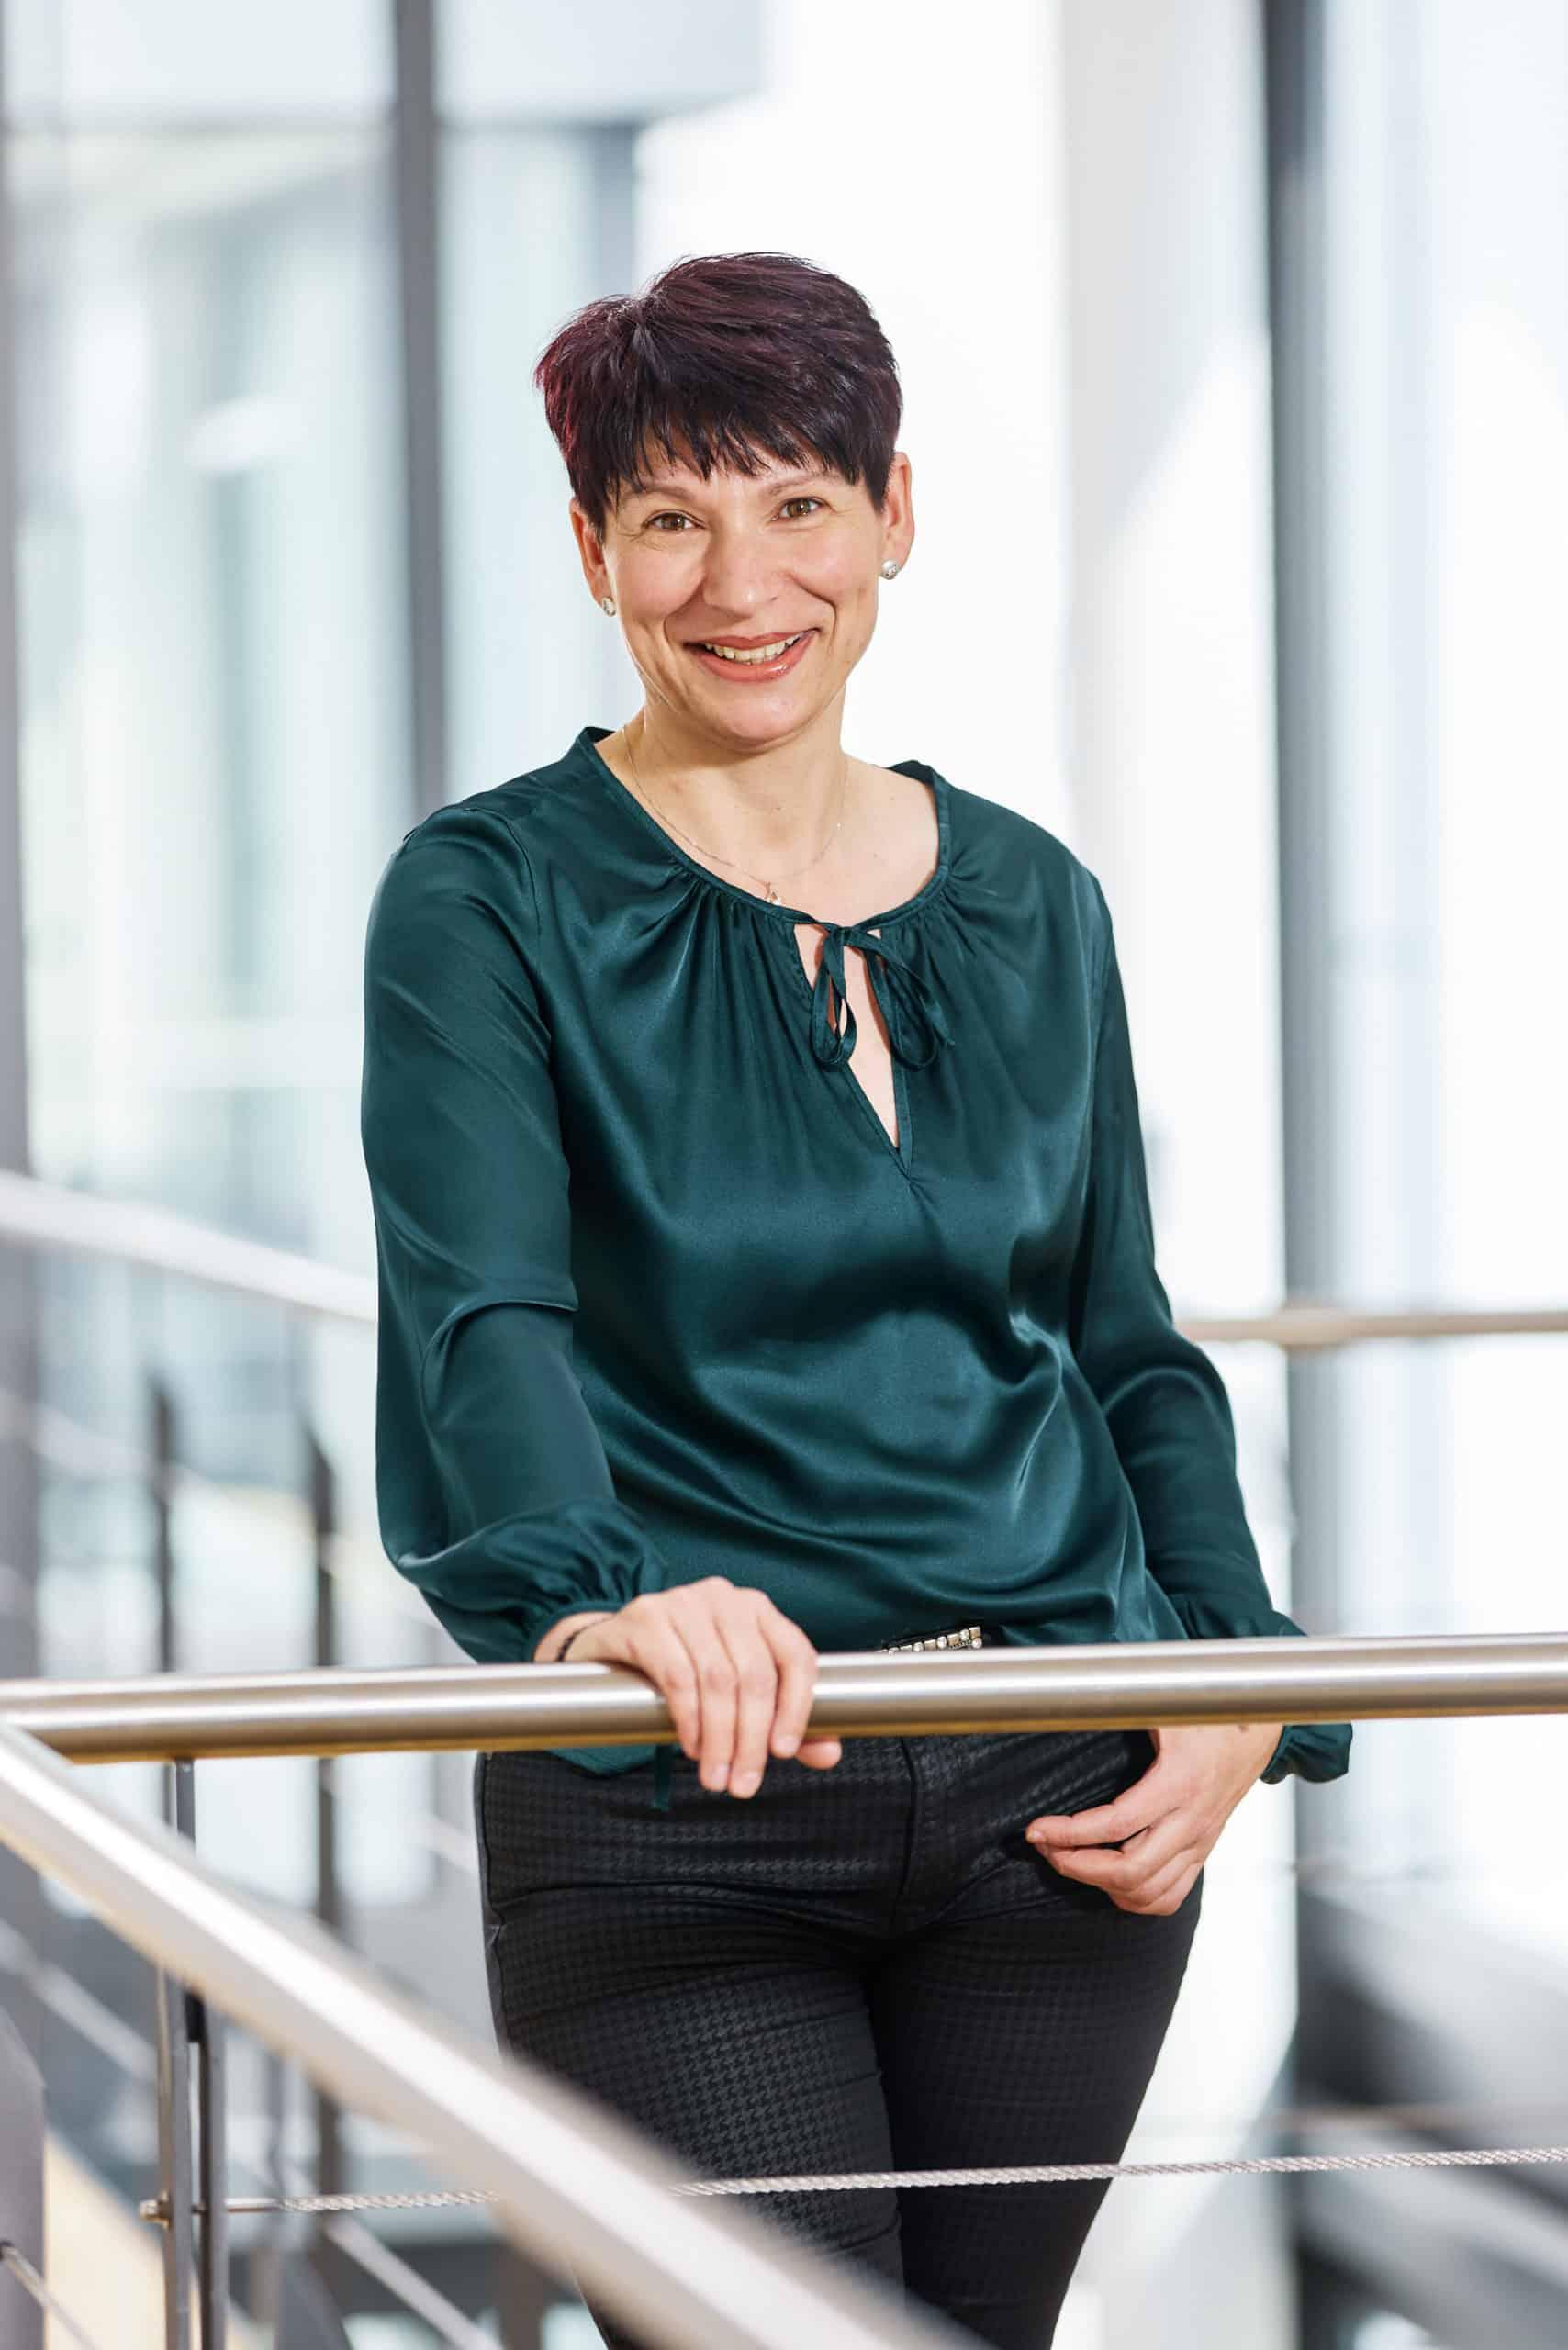 Pamela Blumert